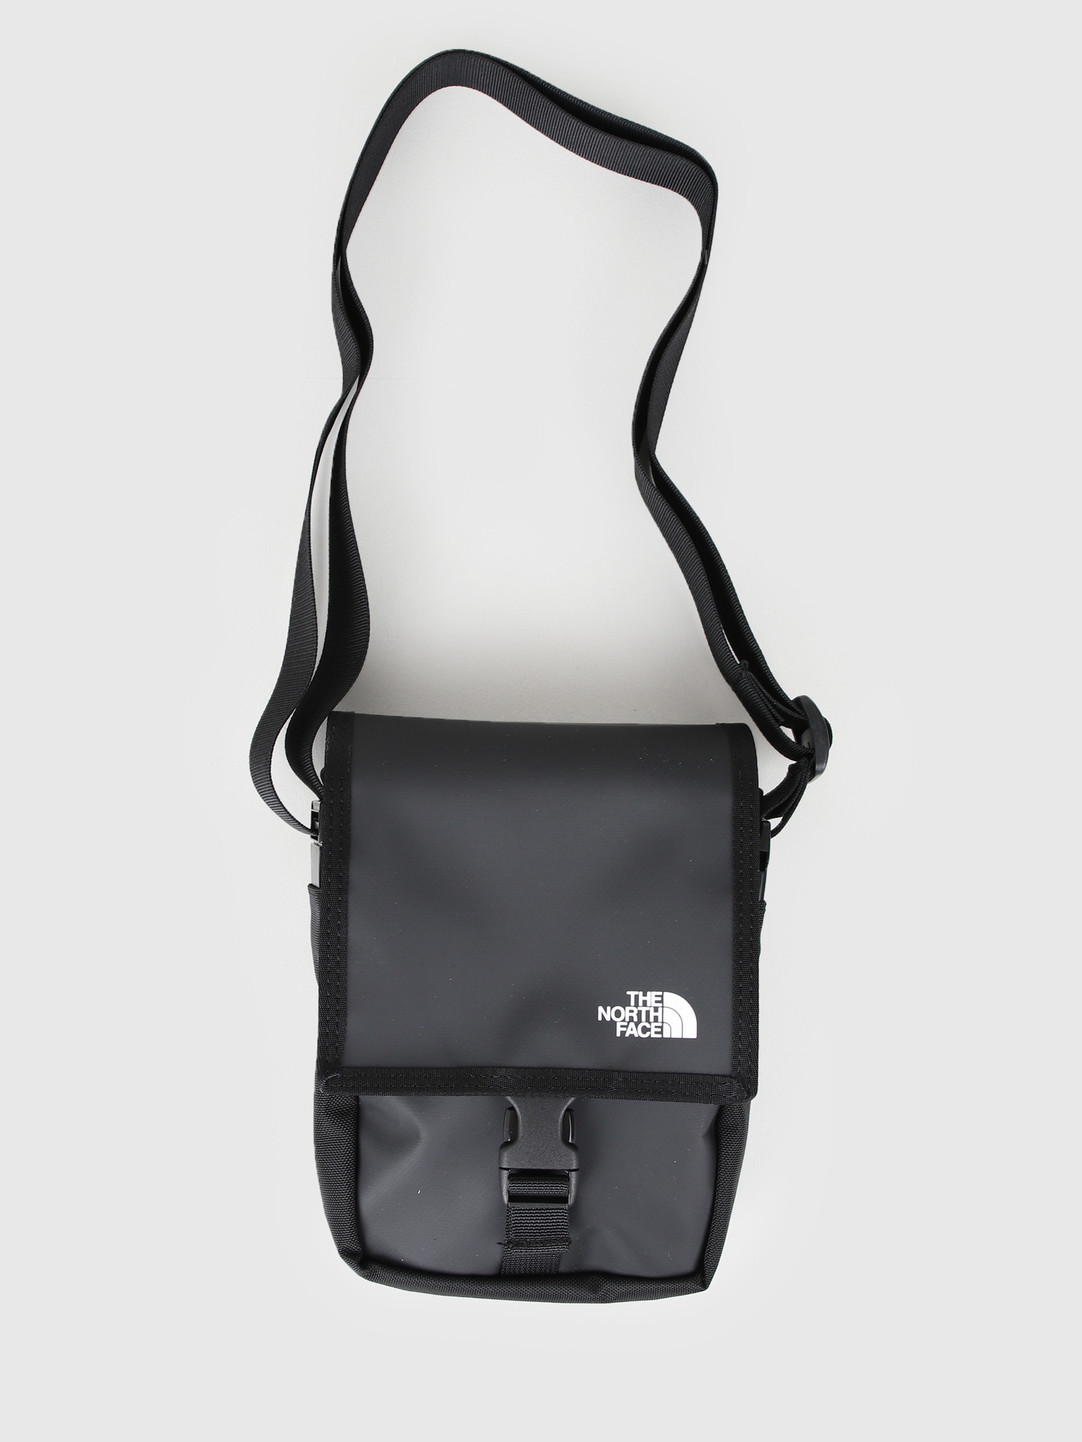 41224d459 The North Face Bardu Bag Black White T0AVAQKY4